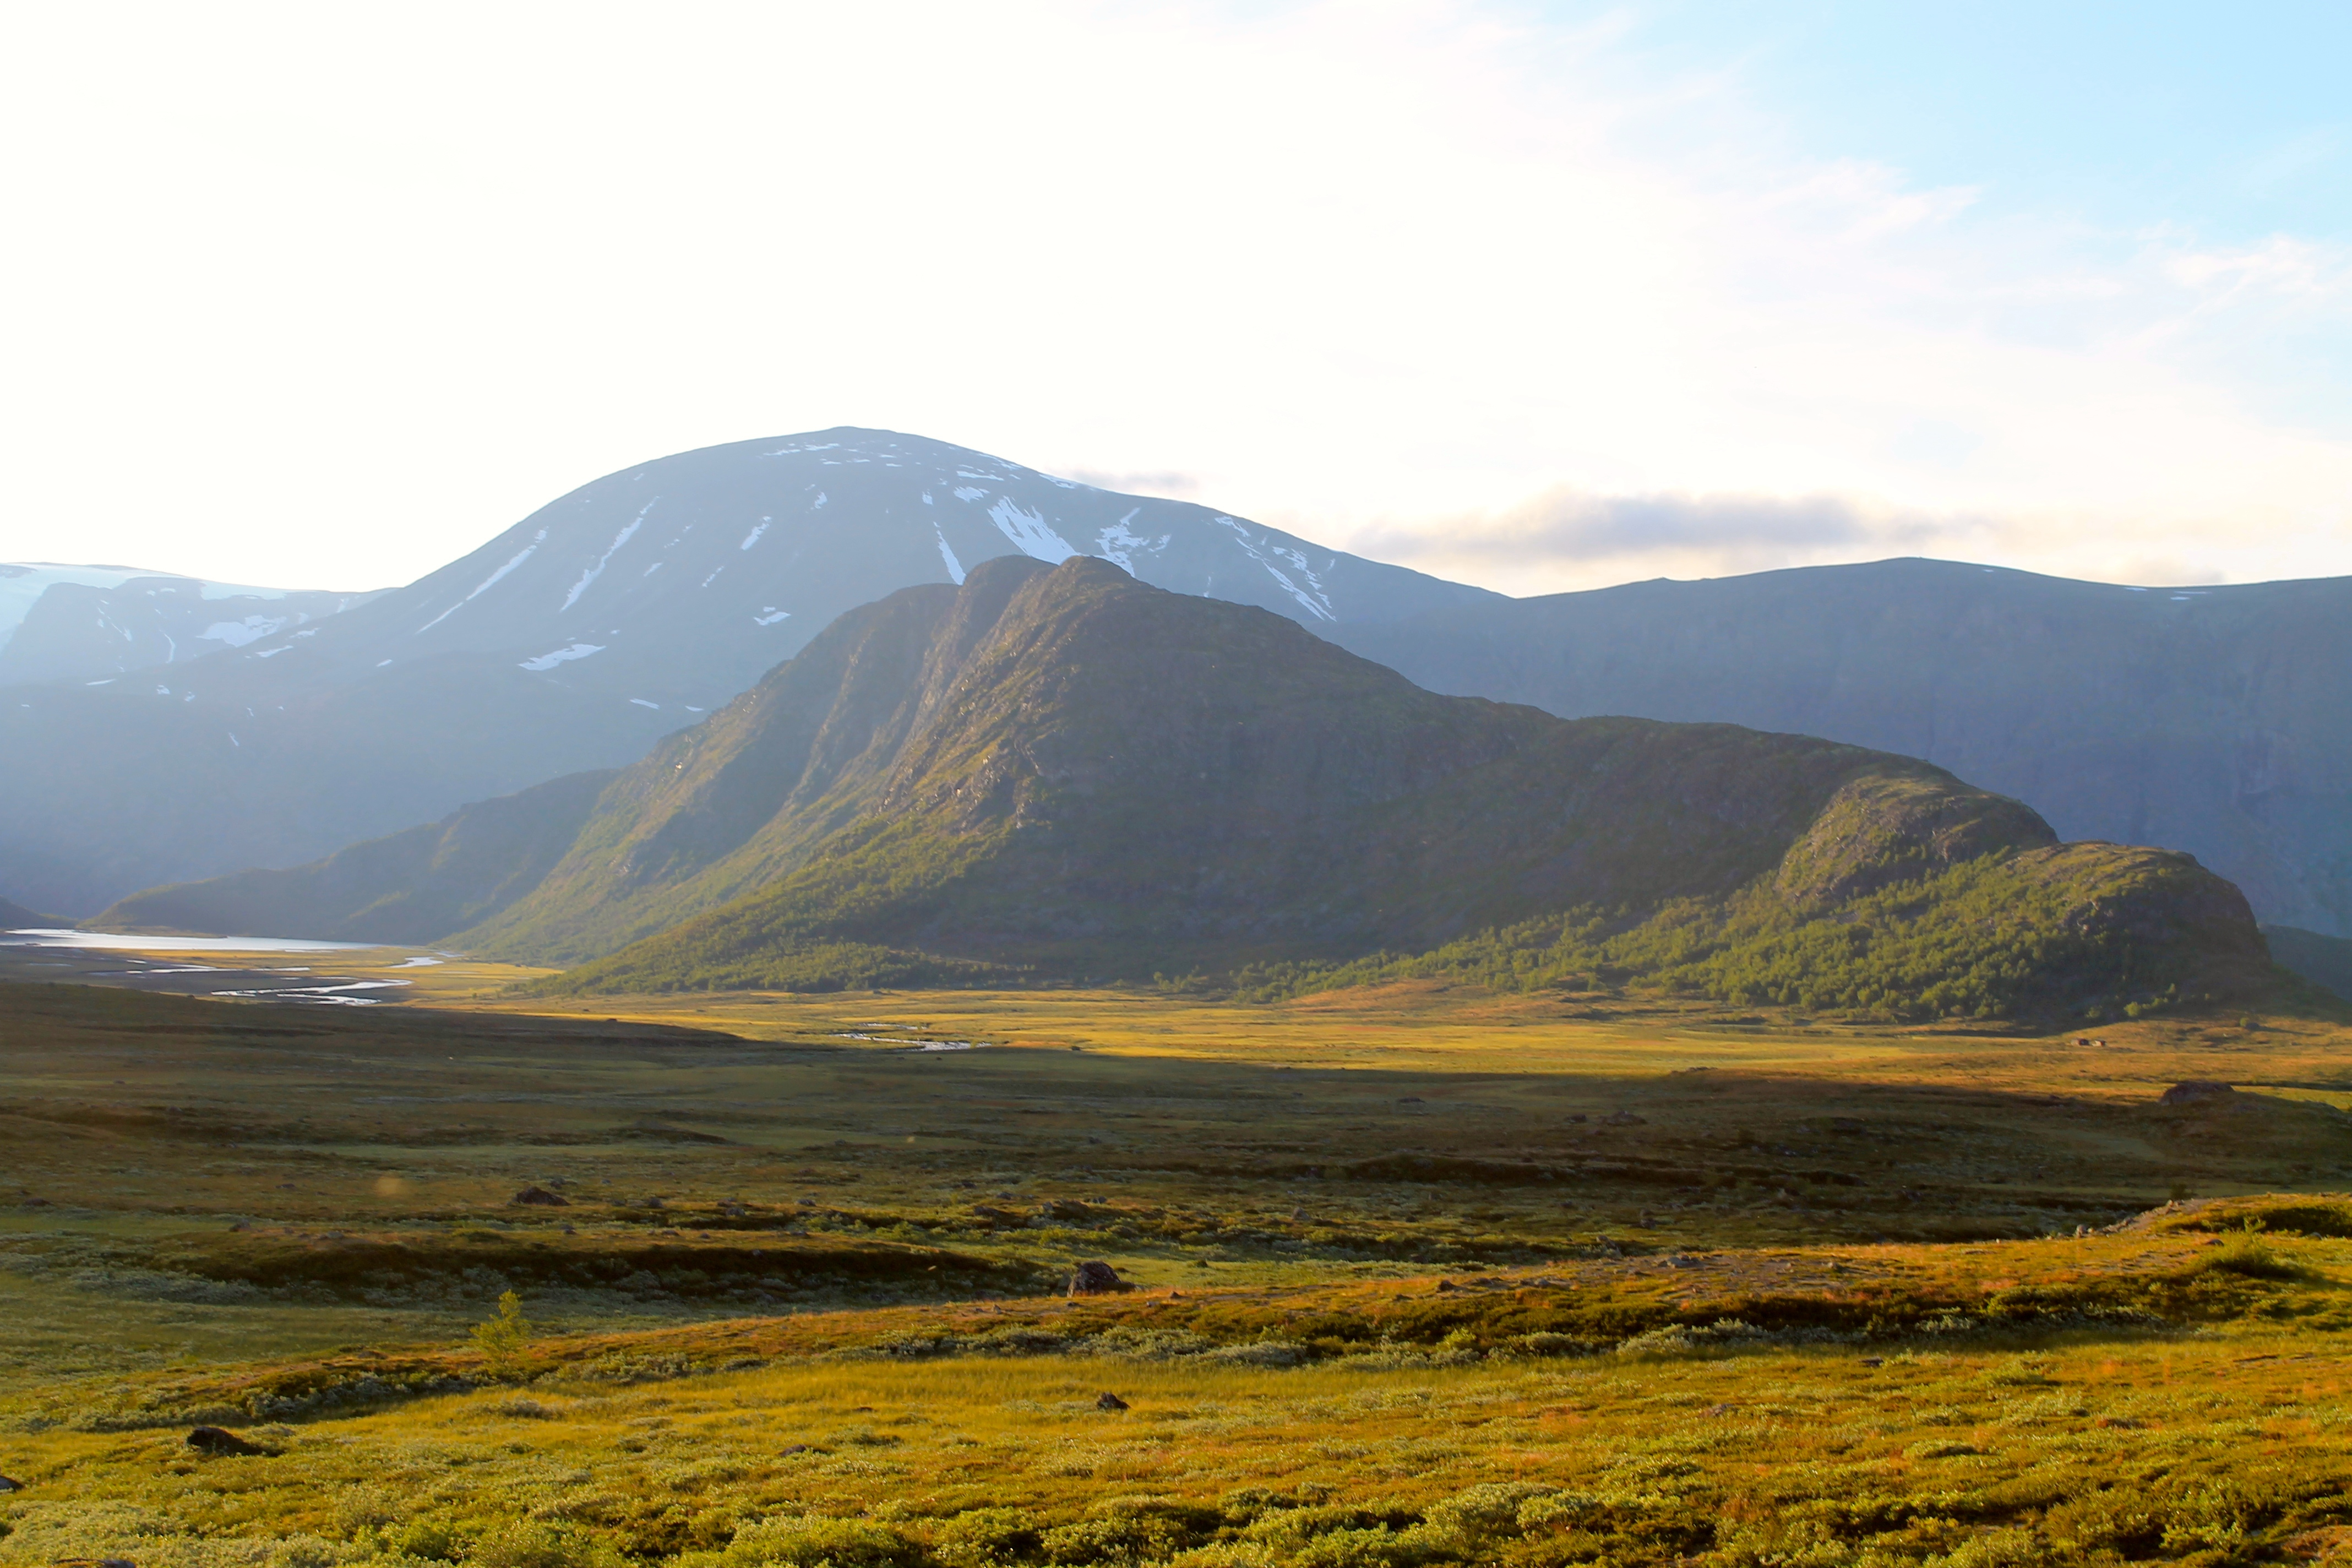 Den luftige fjellryggen Knutshøe ved Gjende i Jotunheimen.